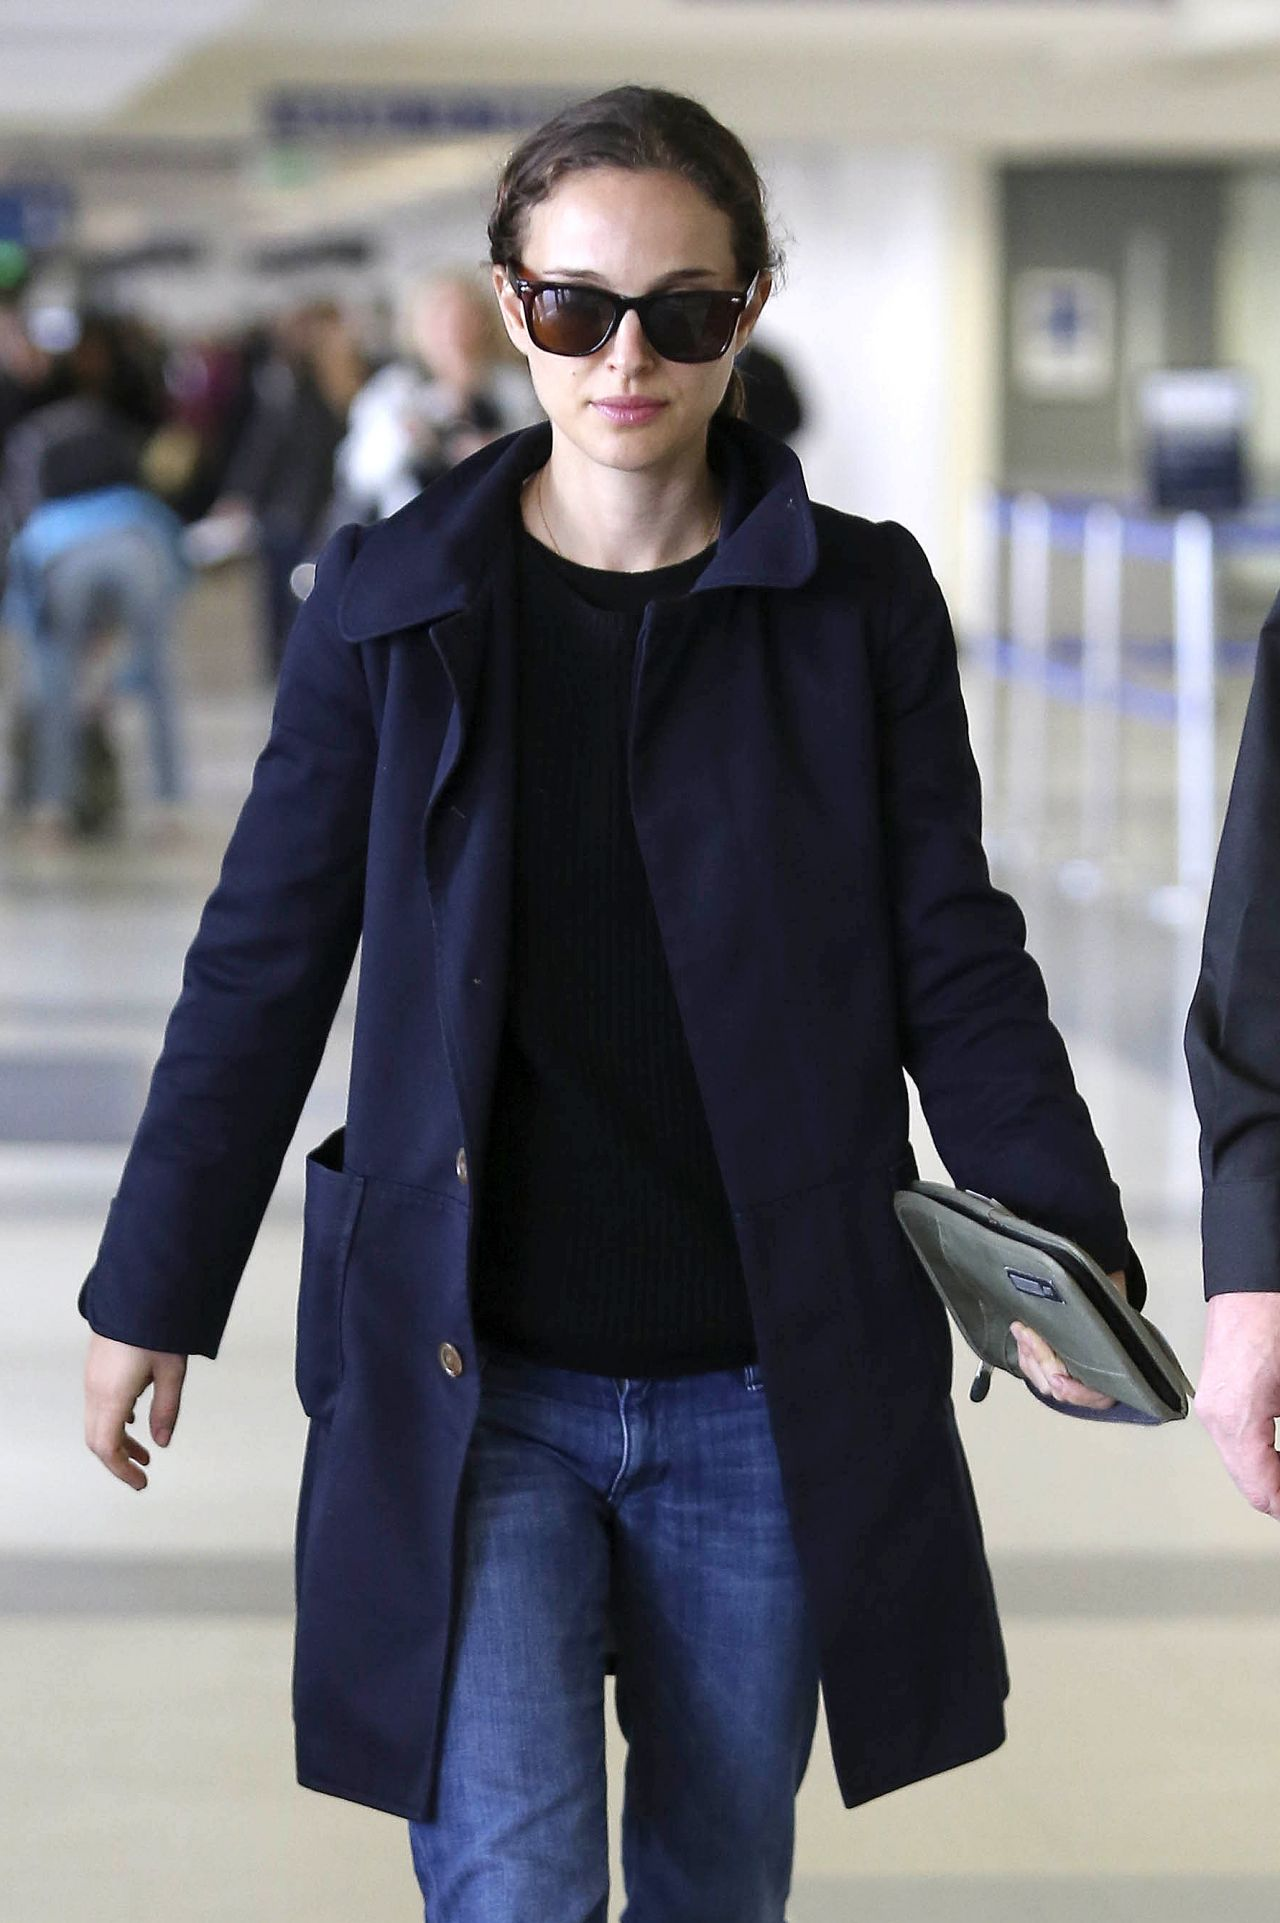 Natalie Portman Street Style At Lax Airport November 2013